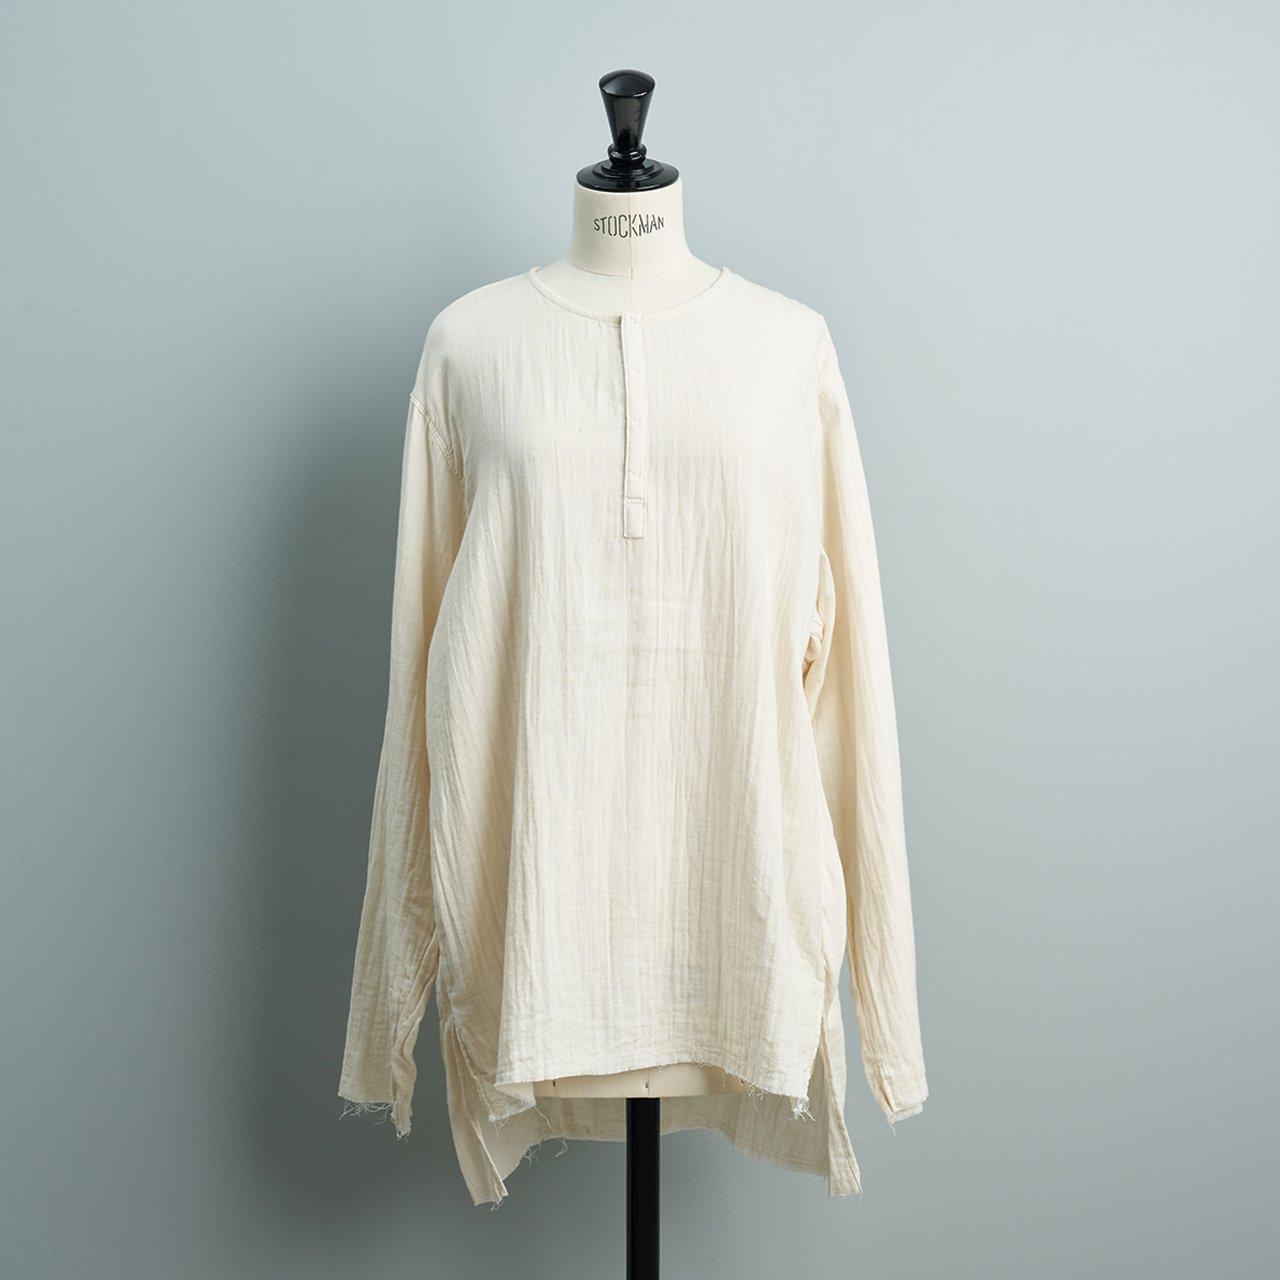 suzuki takayuki <BR>gauze shirt<BR>nude